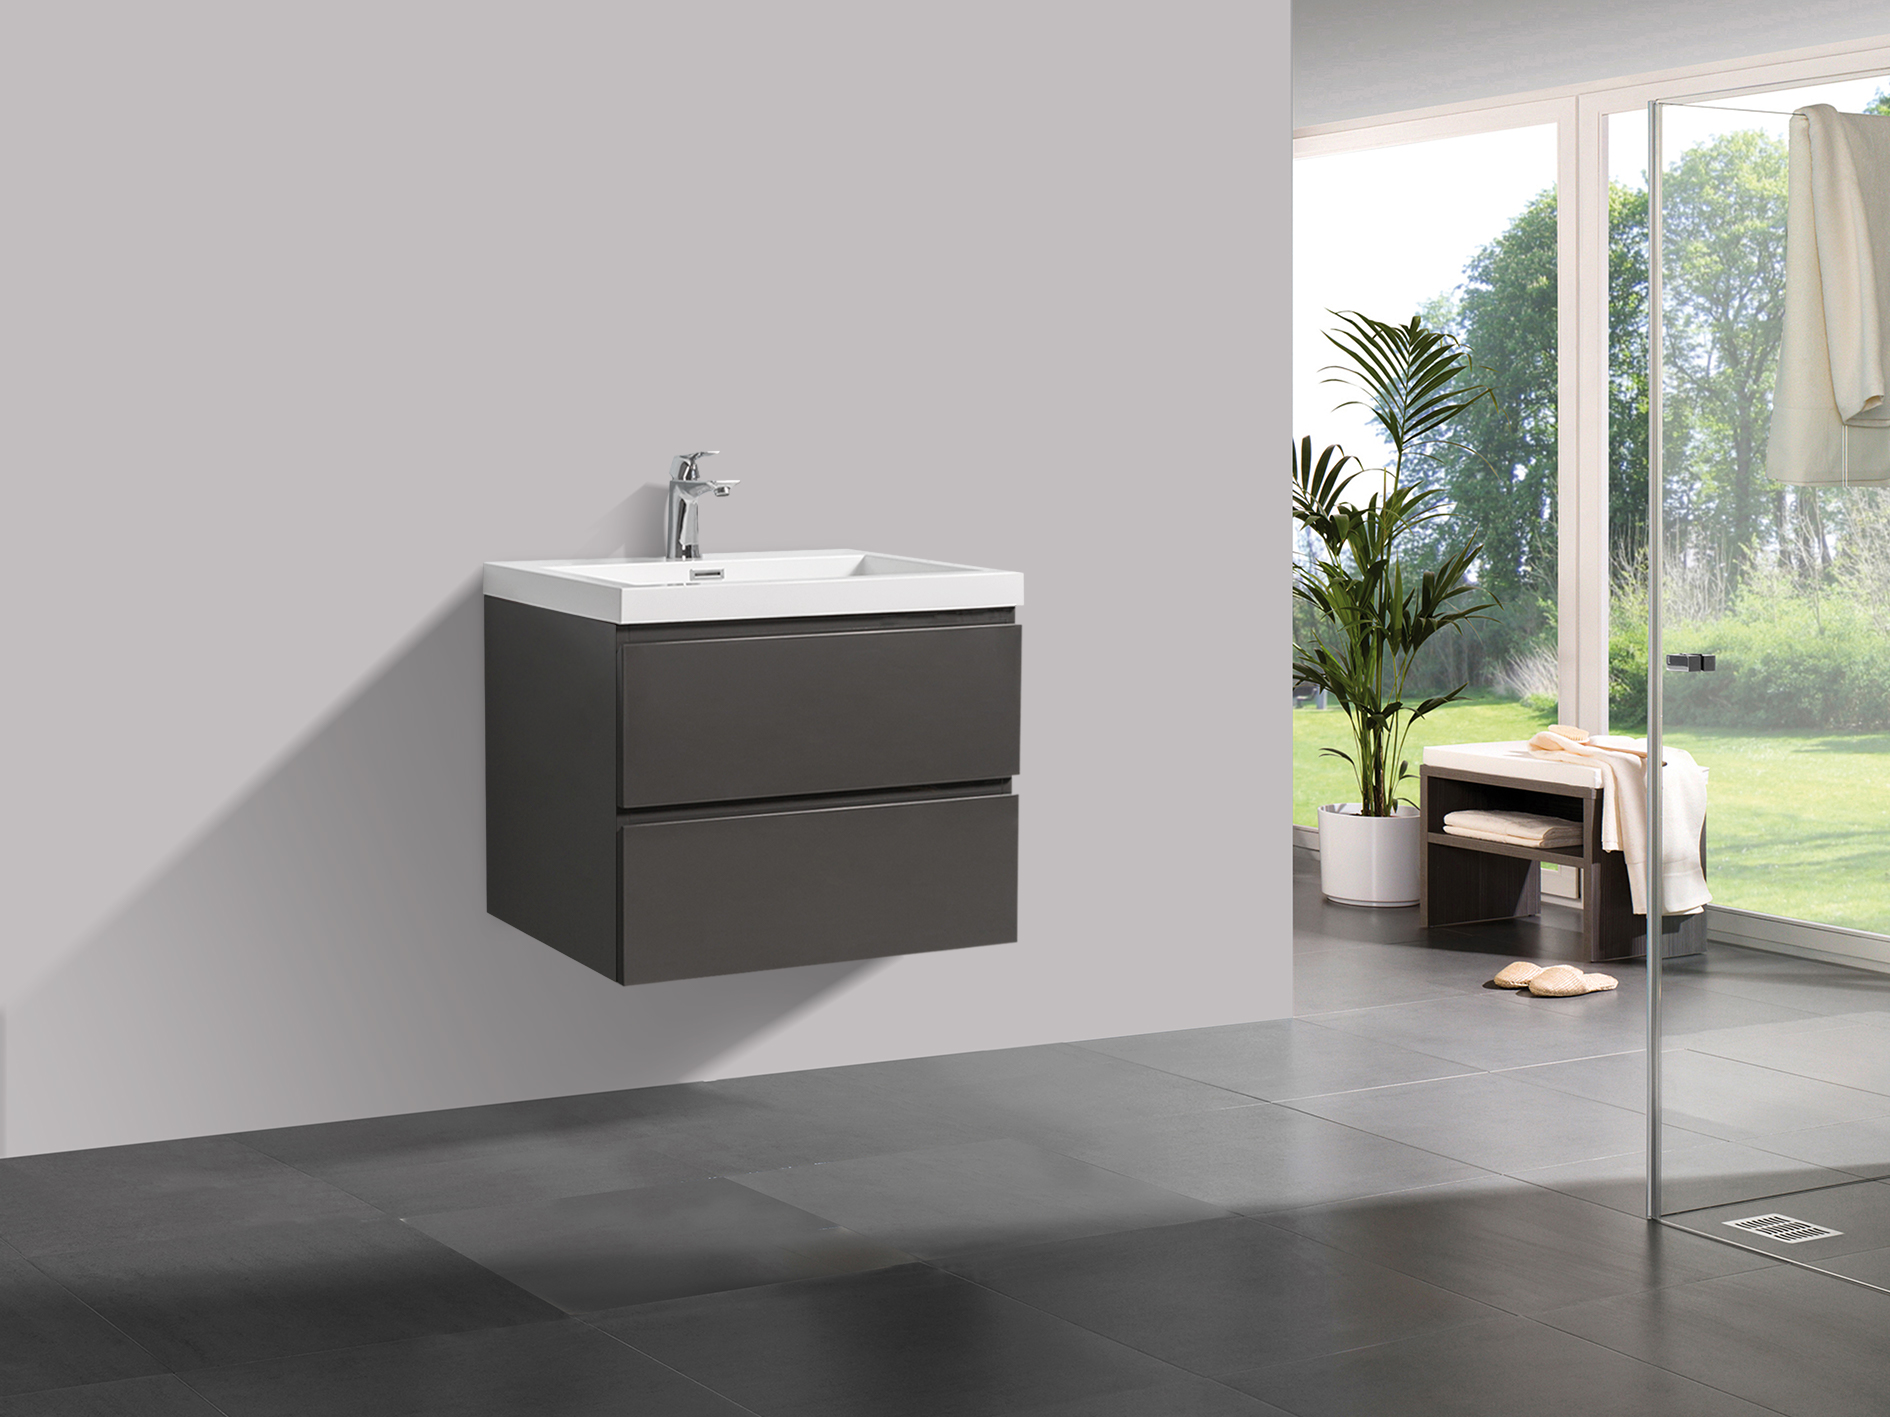 badm bel unterschrank flat 80 hochglanz grau. Black Bedroom Furniture Sets. Home Design Ideas